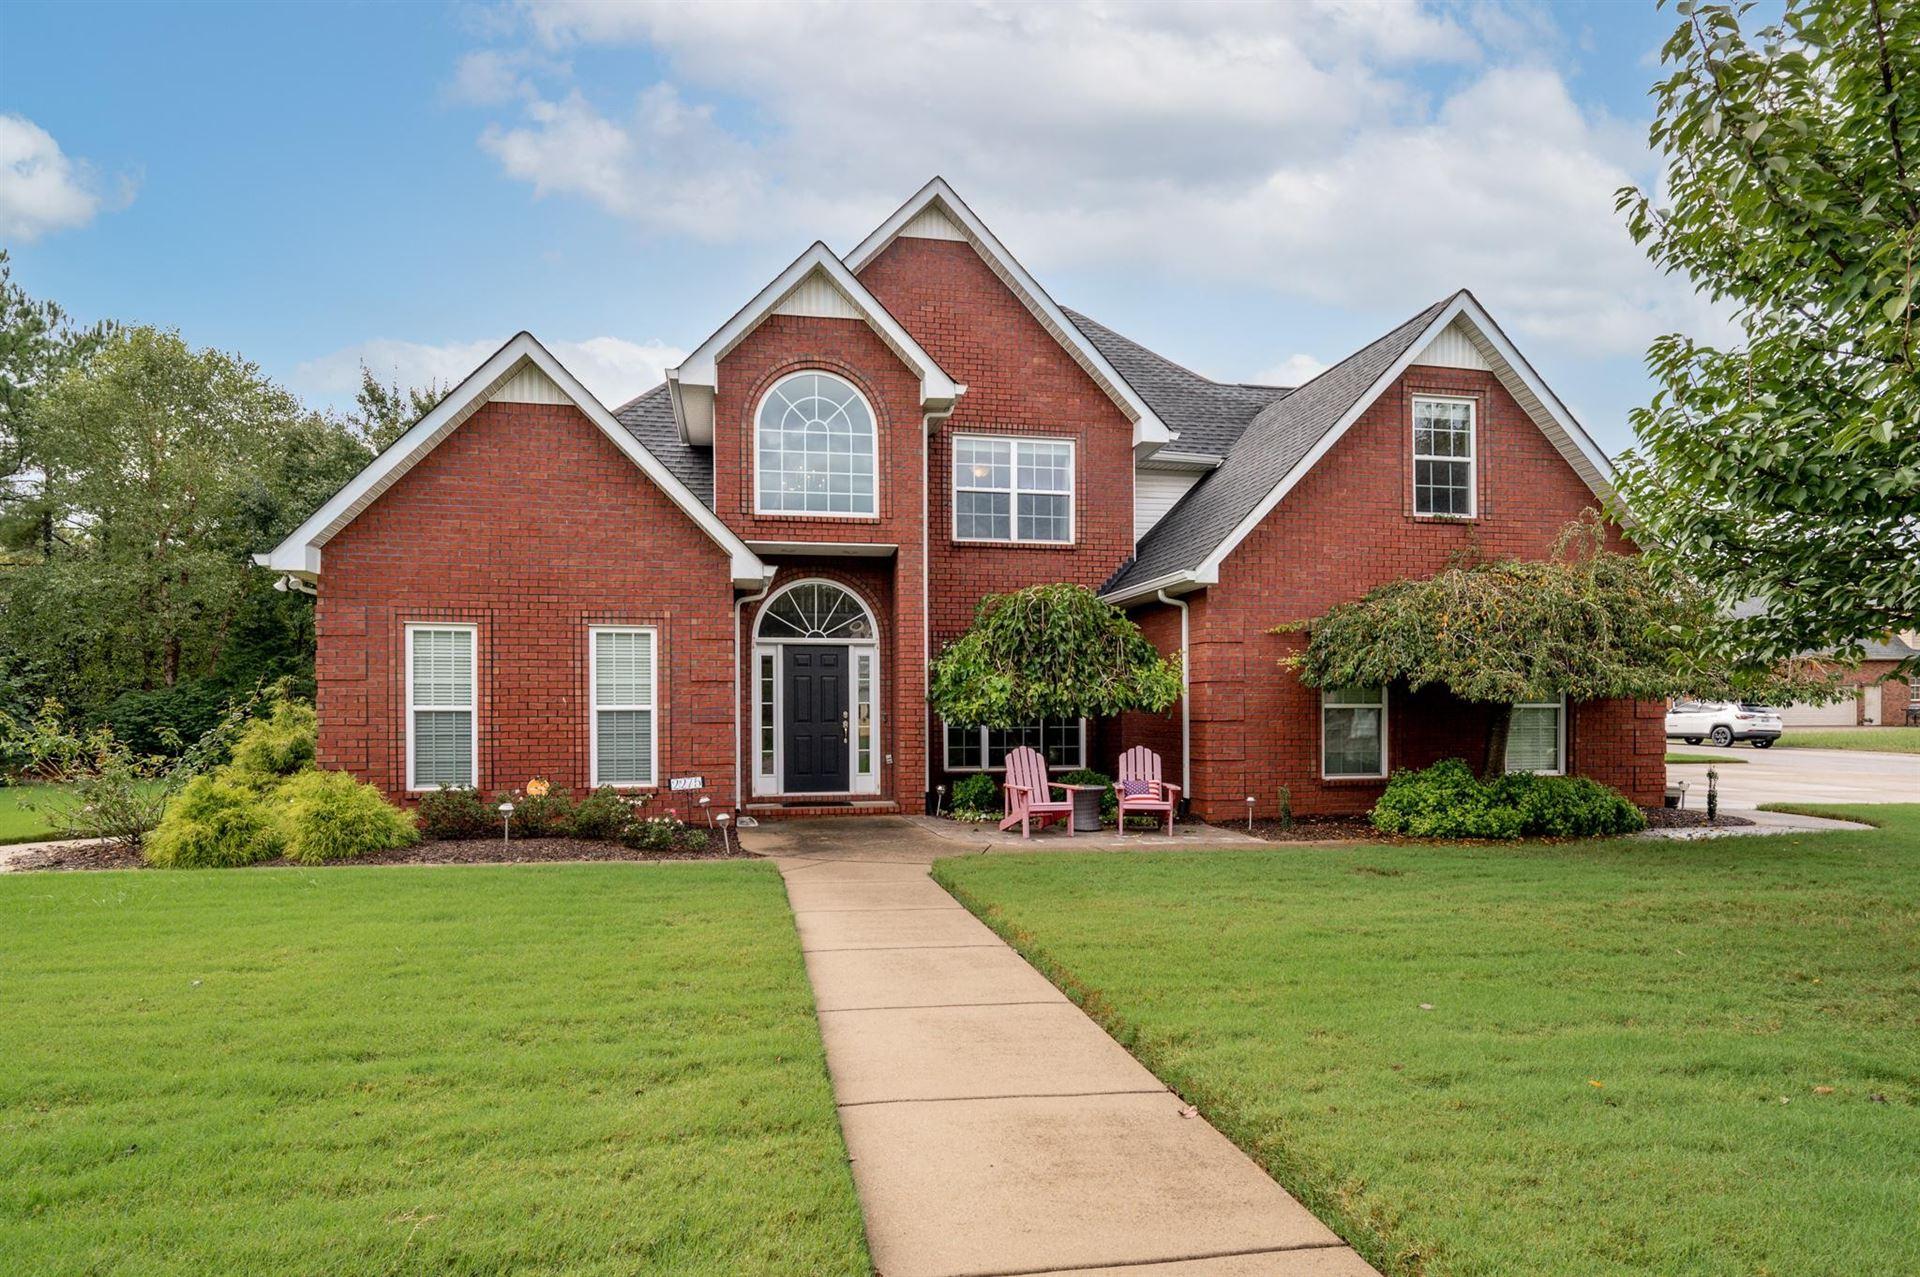 2275 Alexander Blvd, Murfreesboro, TN 37130 - MLS#: 2293665